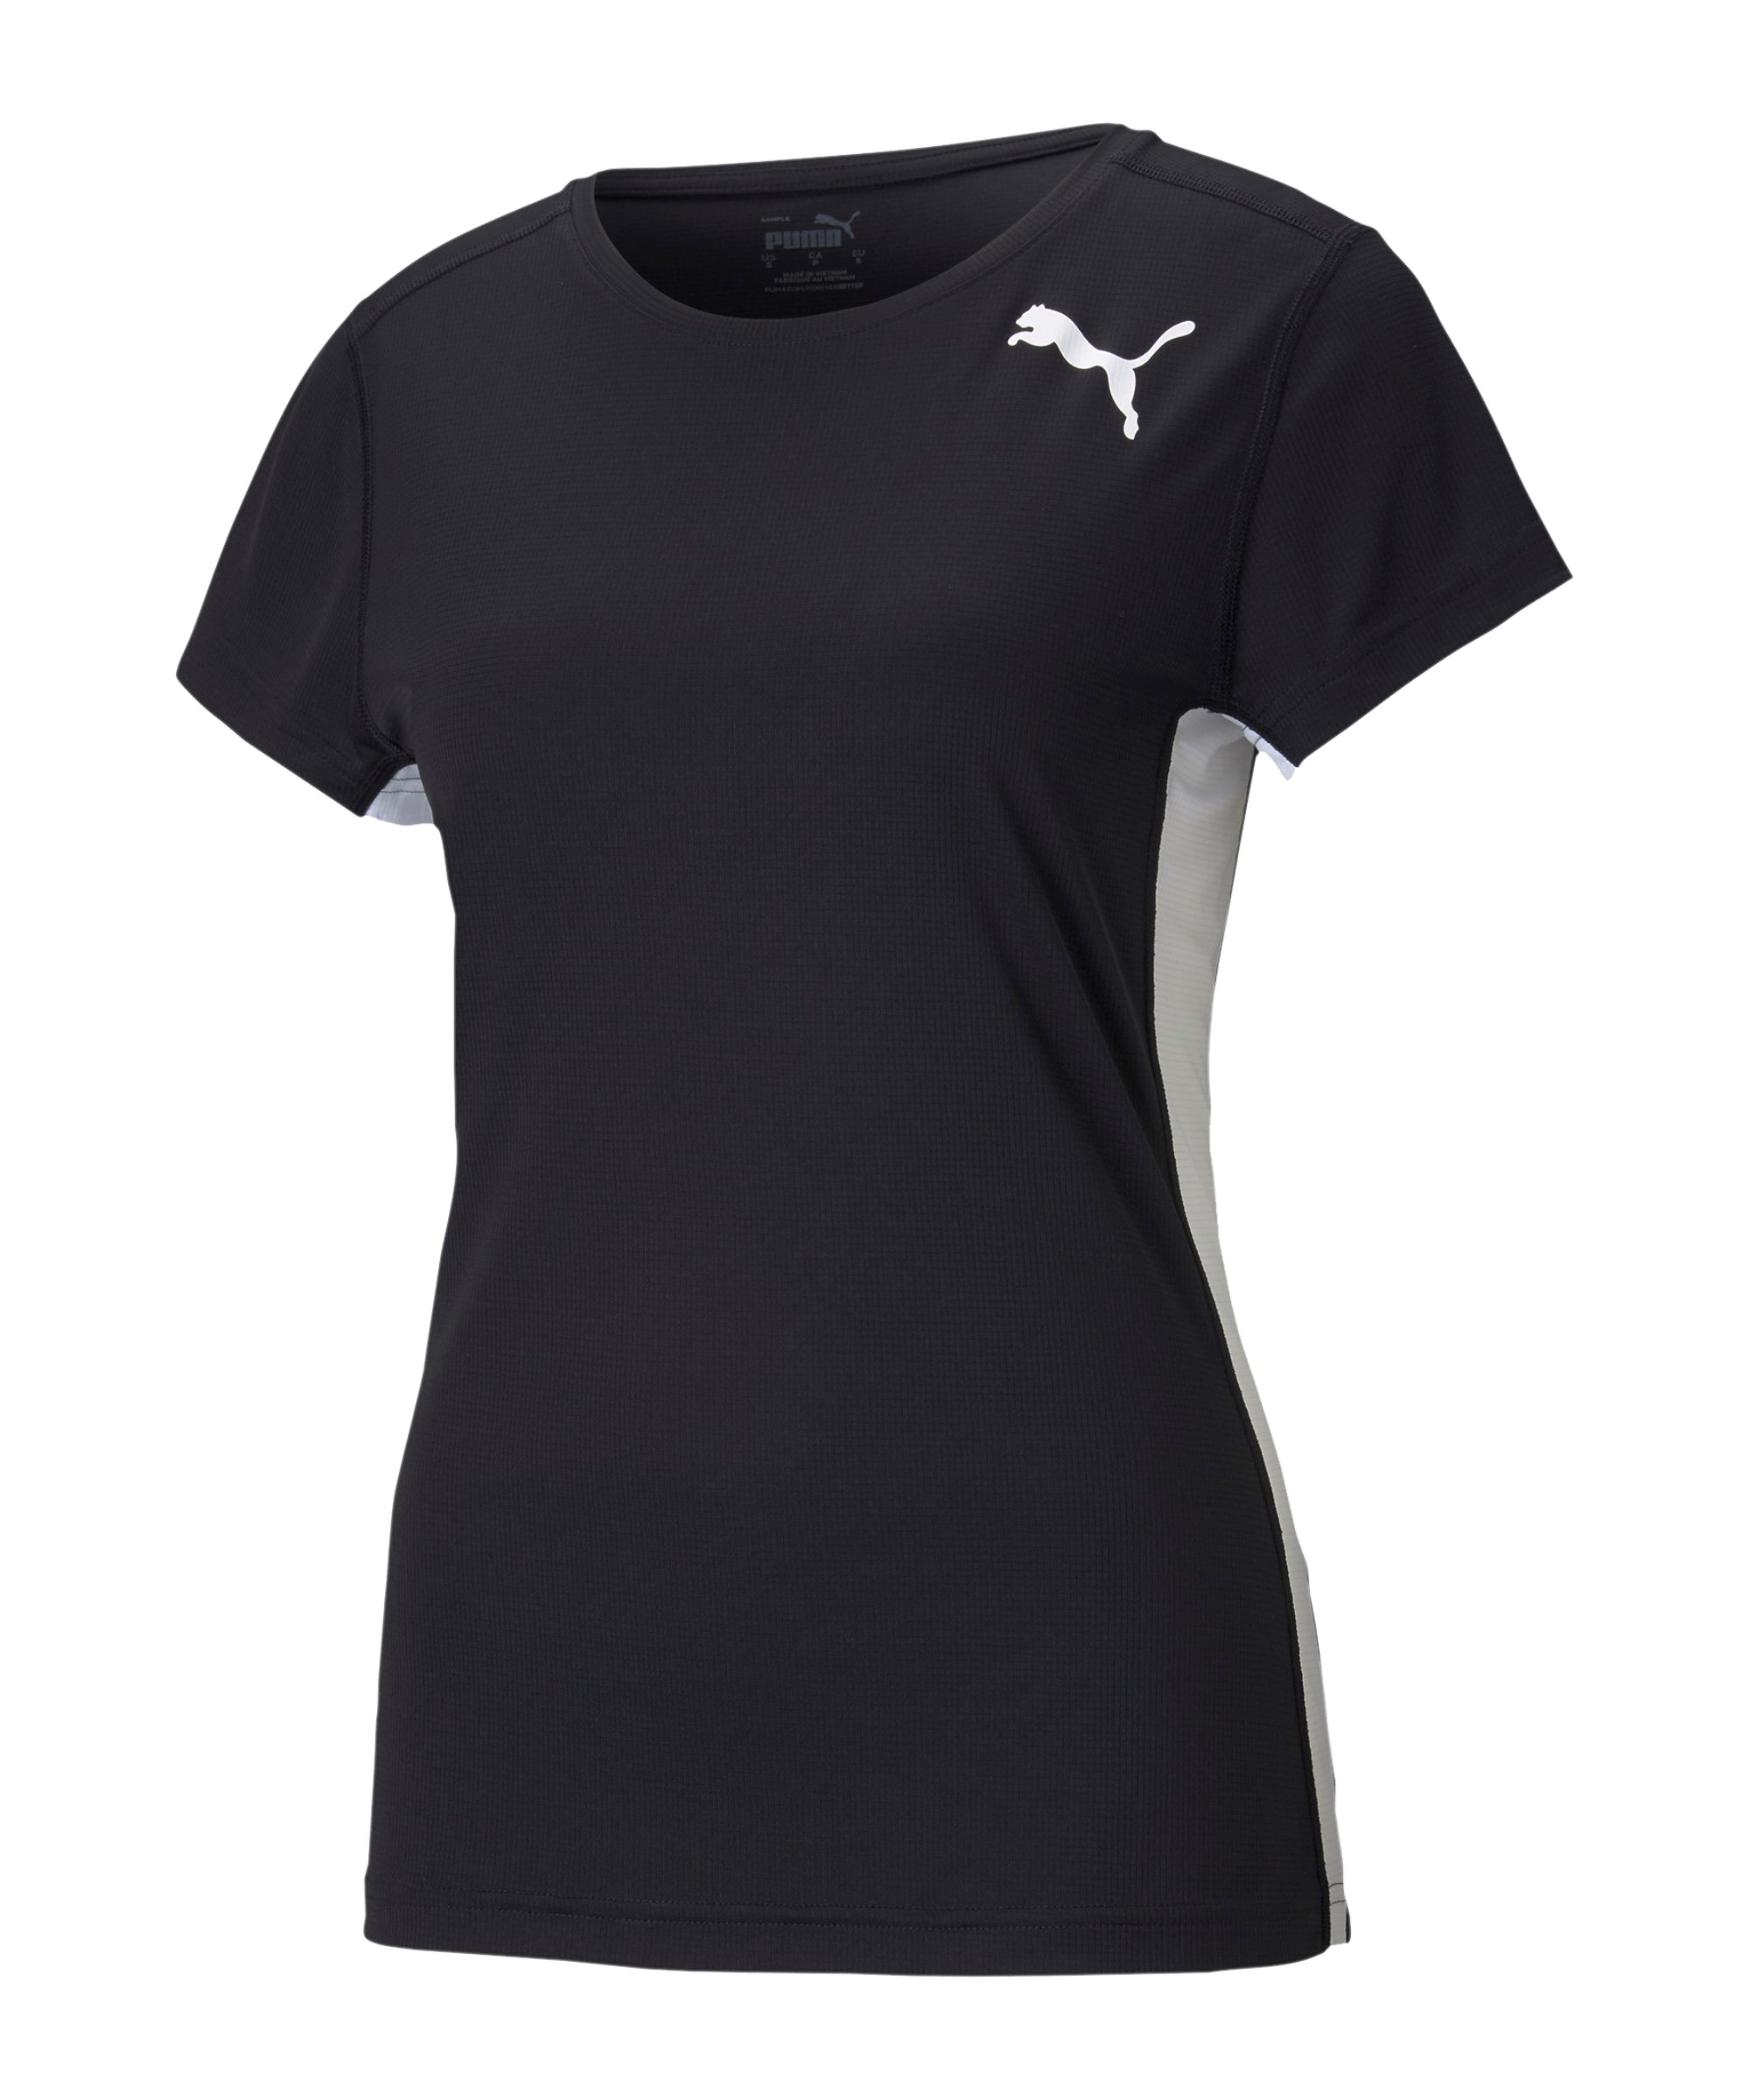 PUMA Cross the Line 2.0 T-Shirt Training Damen F01 - schwarz